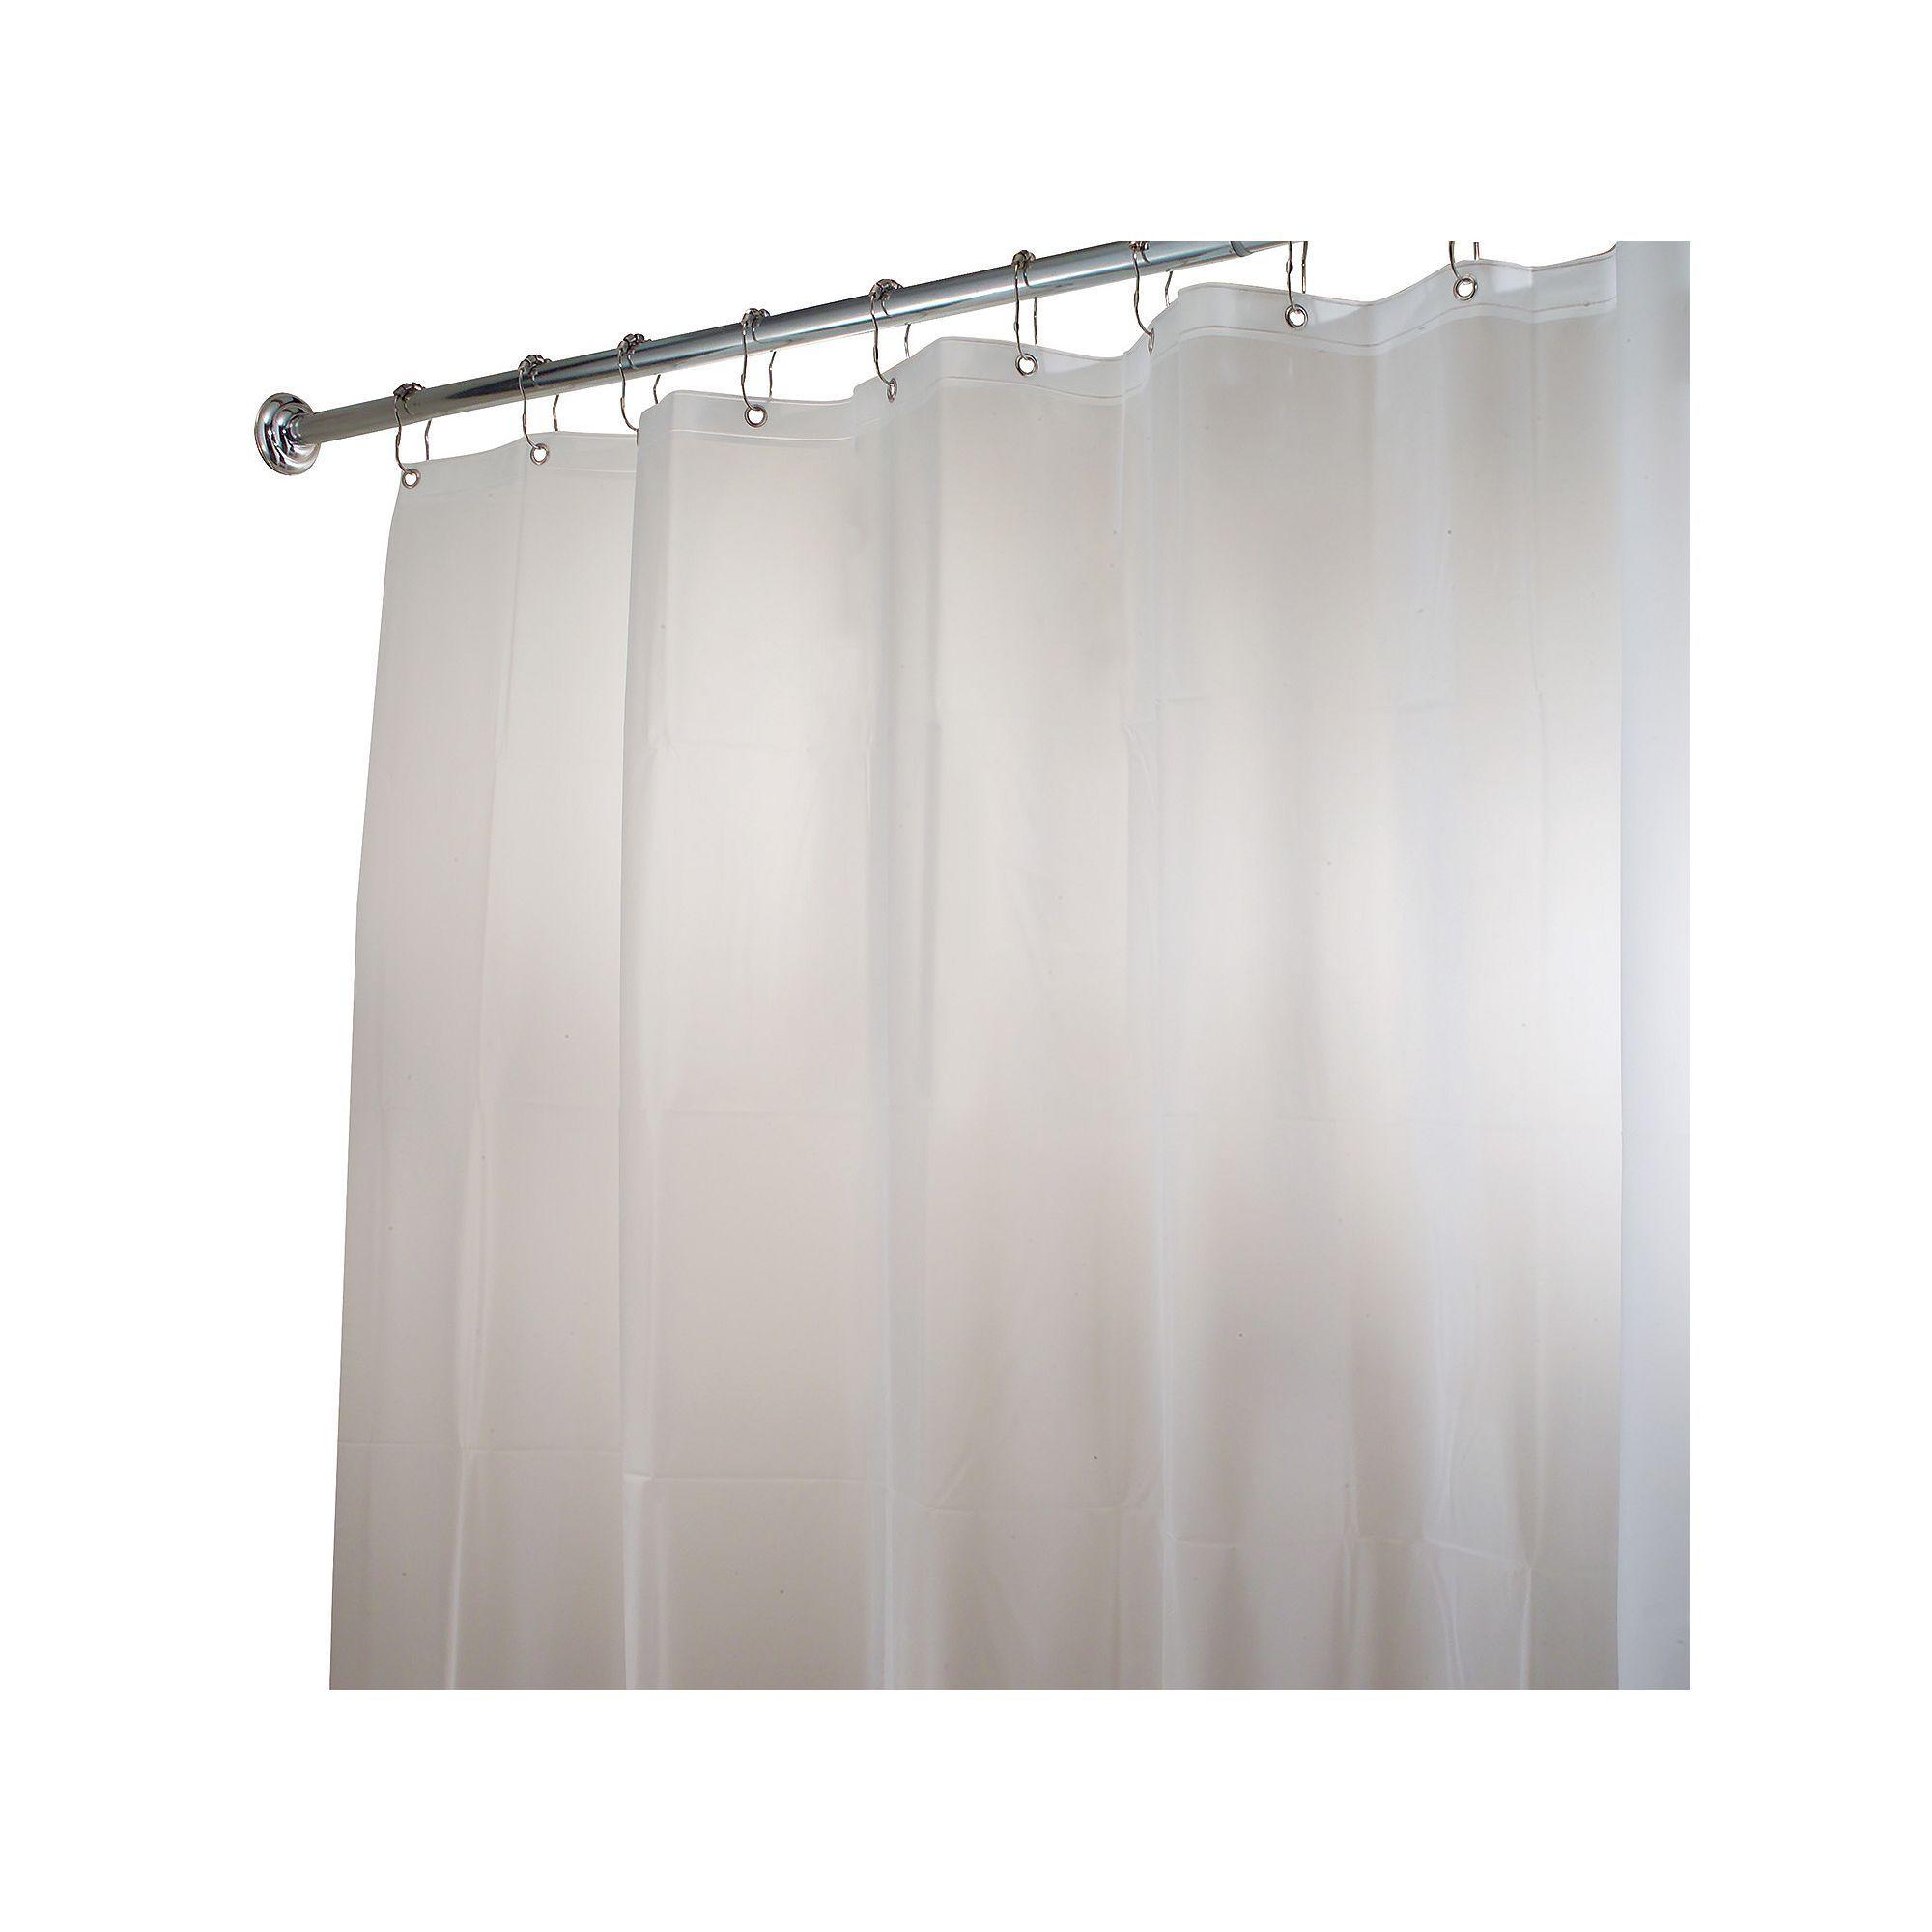 72 x 84 shower curtain liner - urevoo